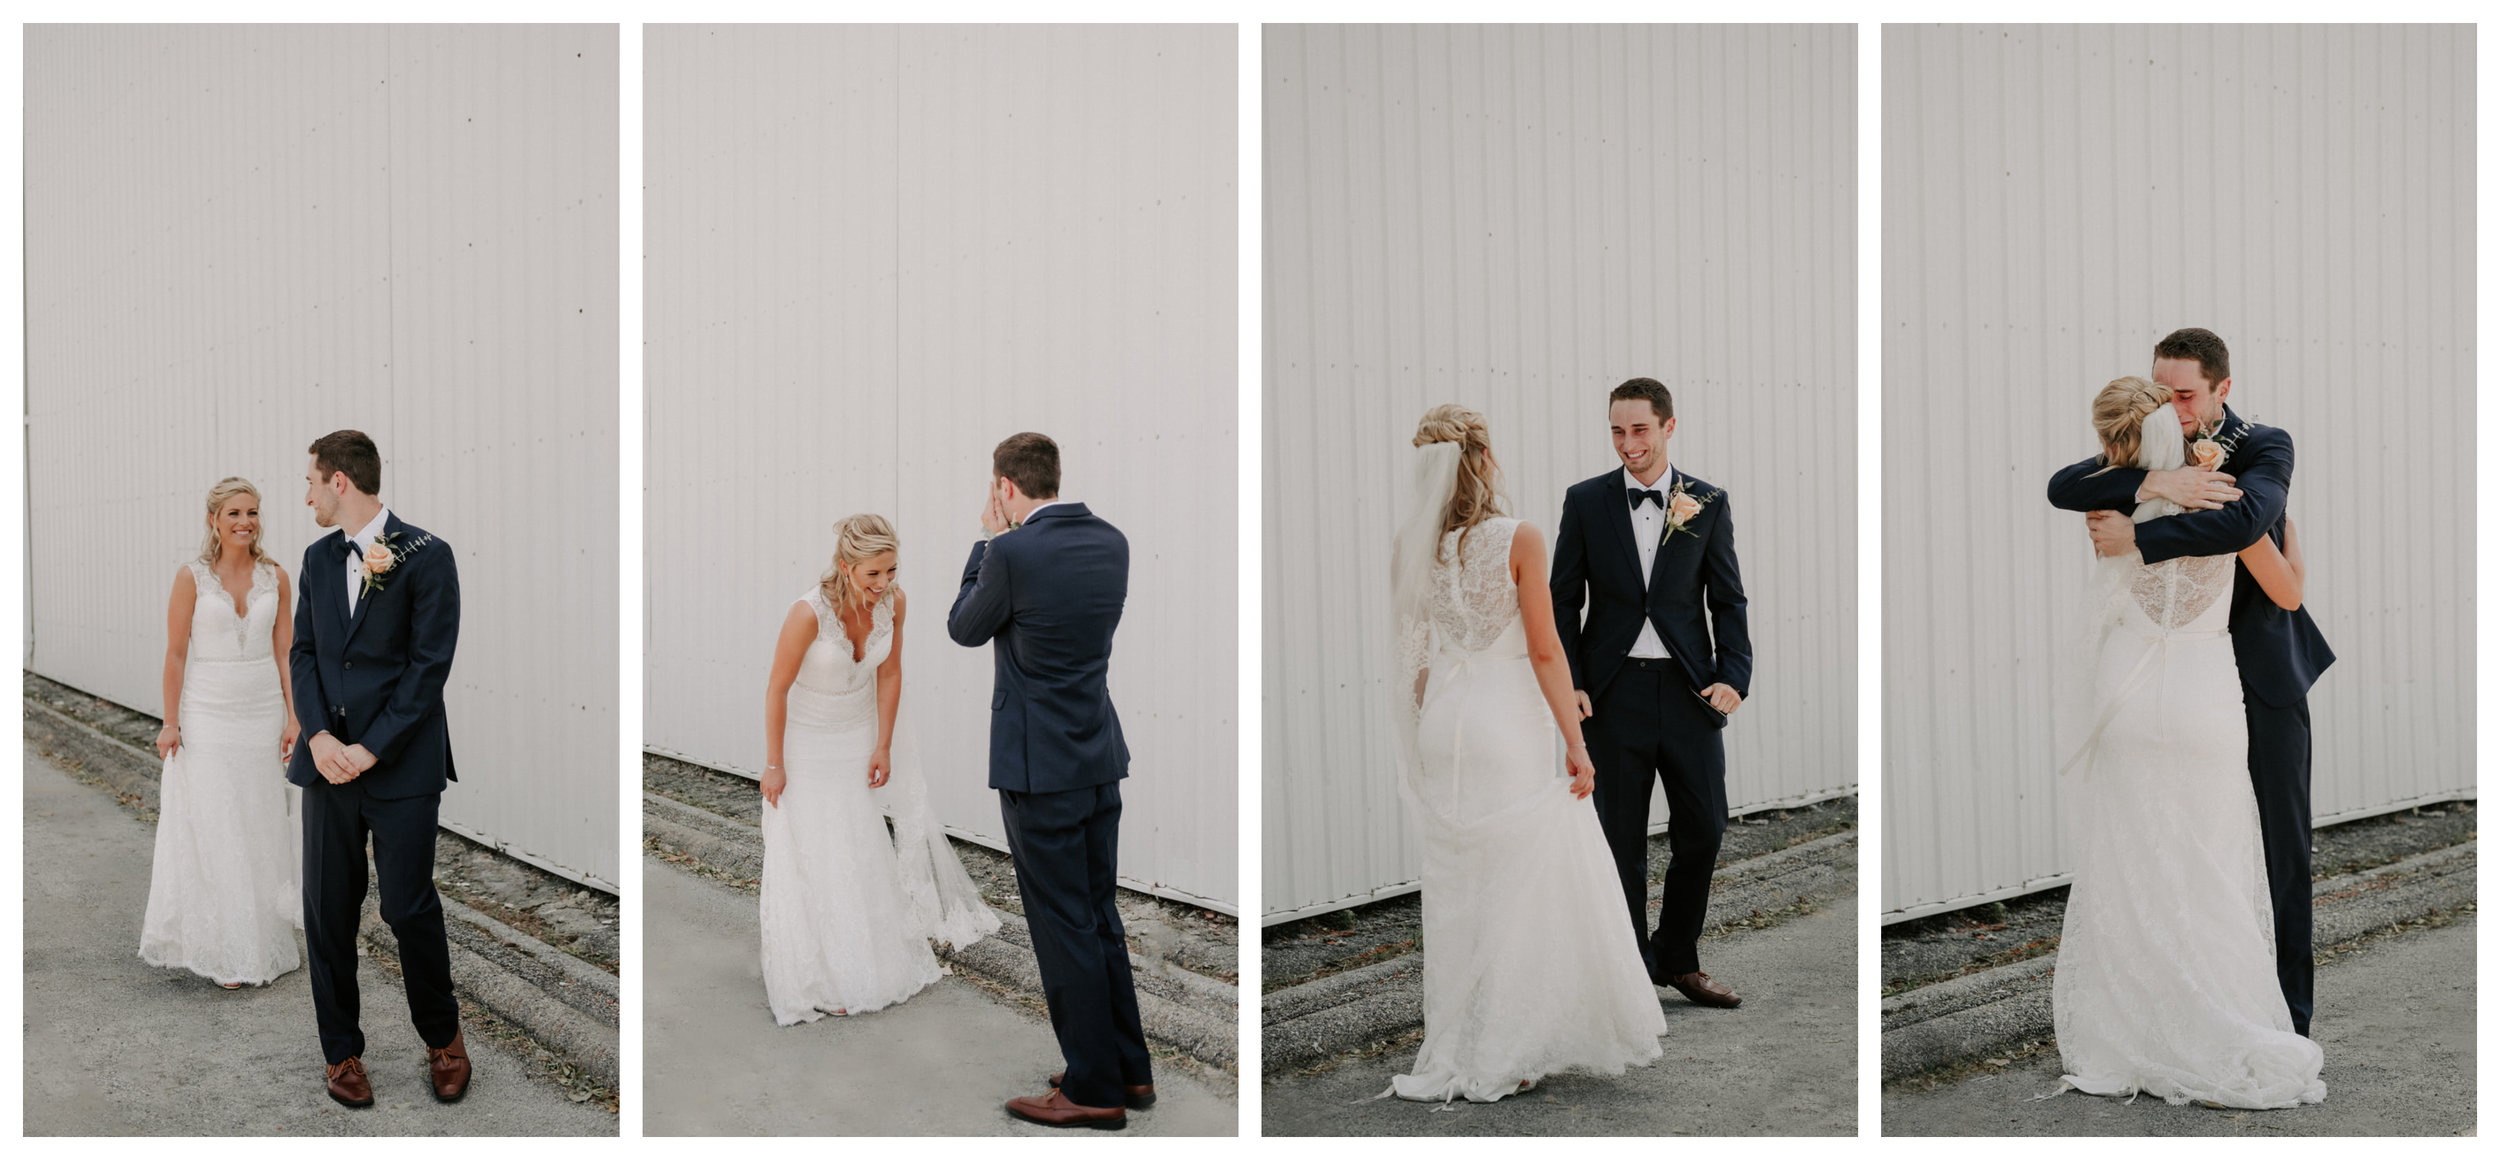 Webster Wedding Blog - Kansas City Bride10